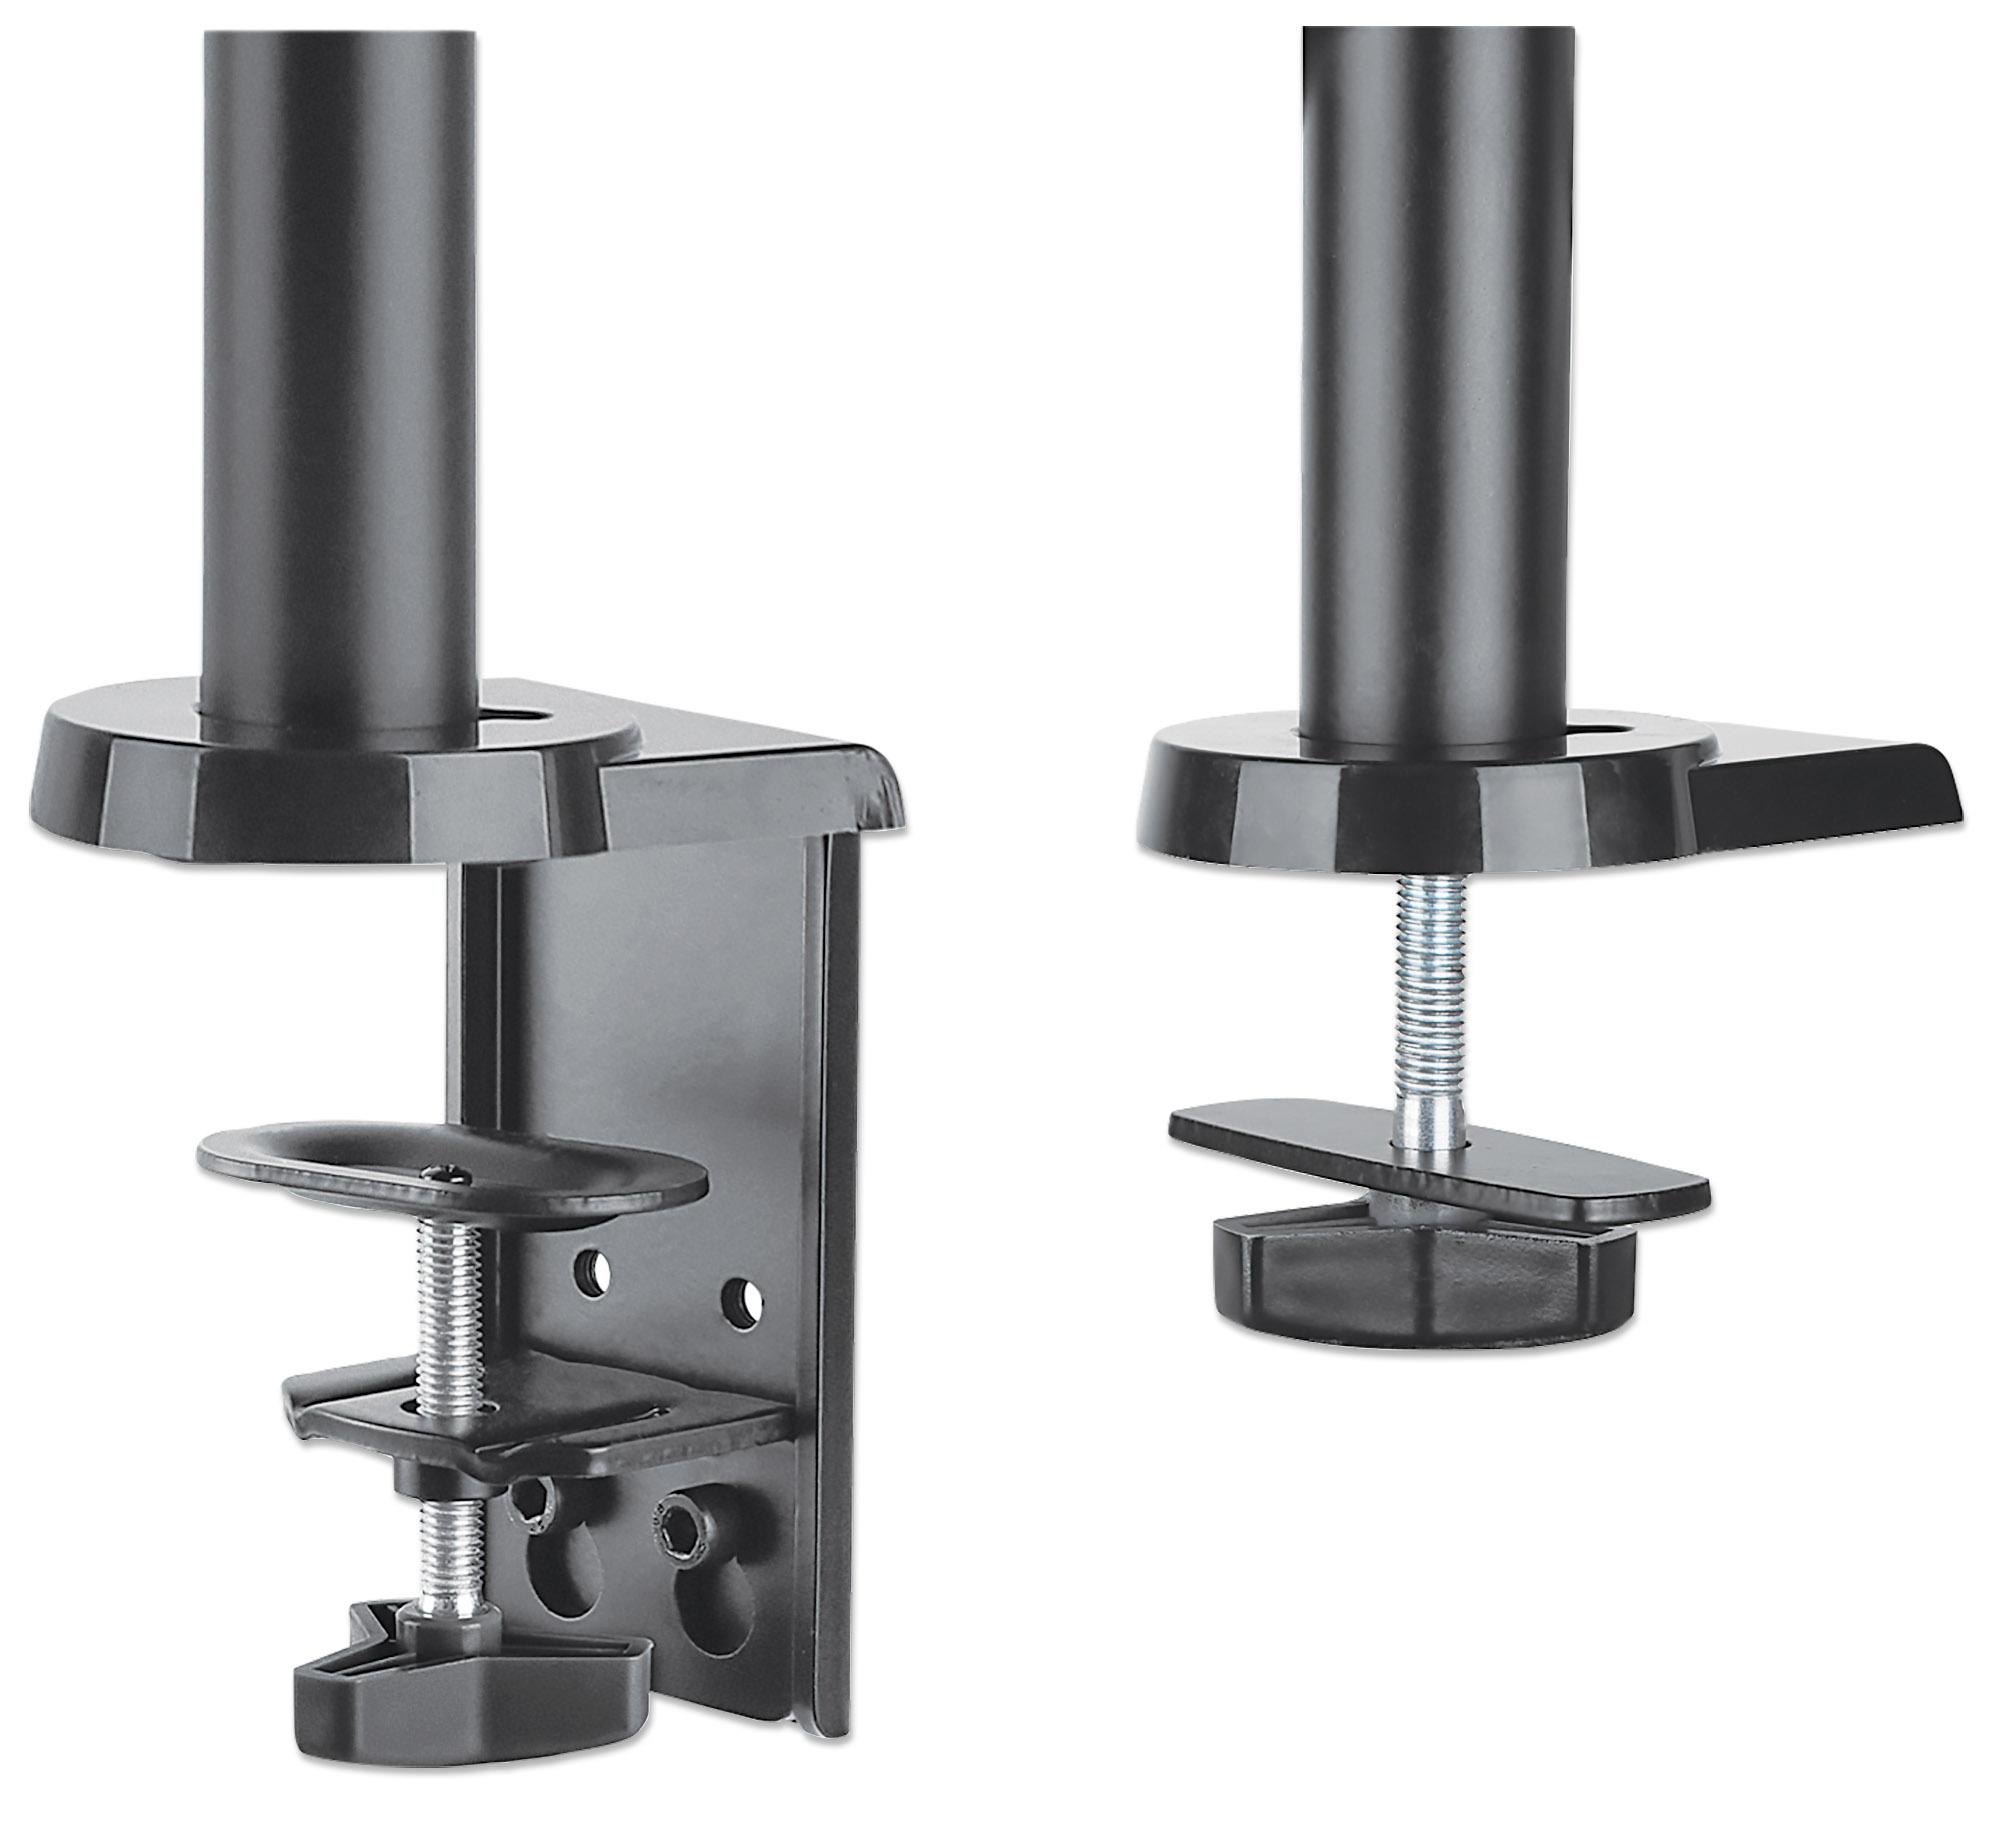 Universal Gas Spring Dual Monitor Mount